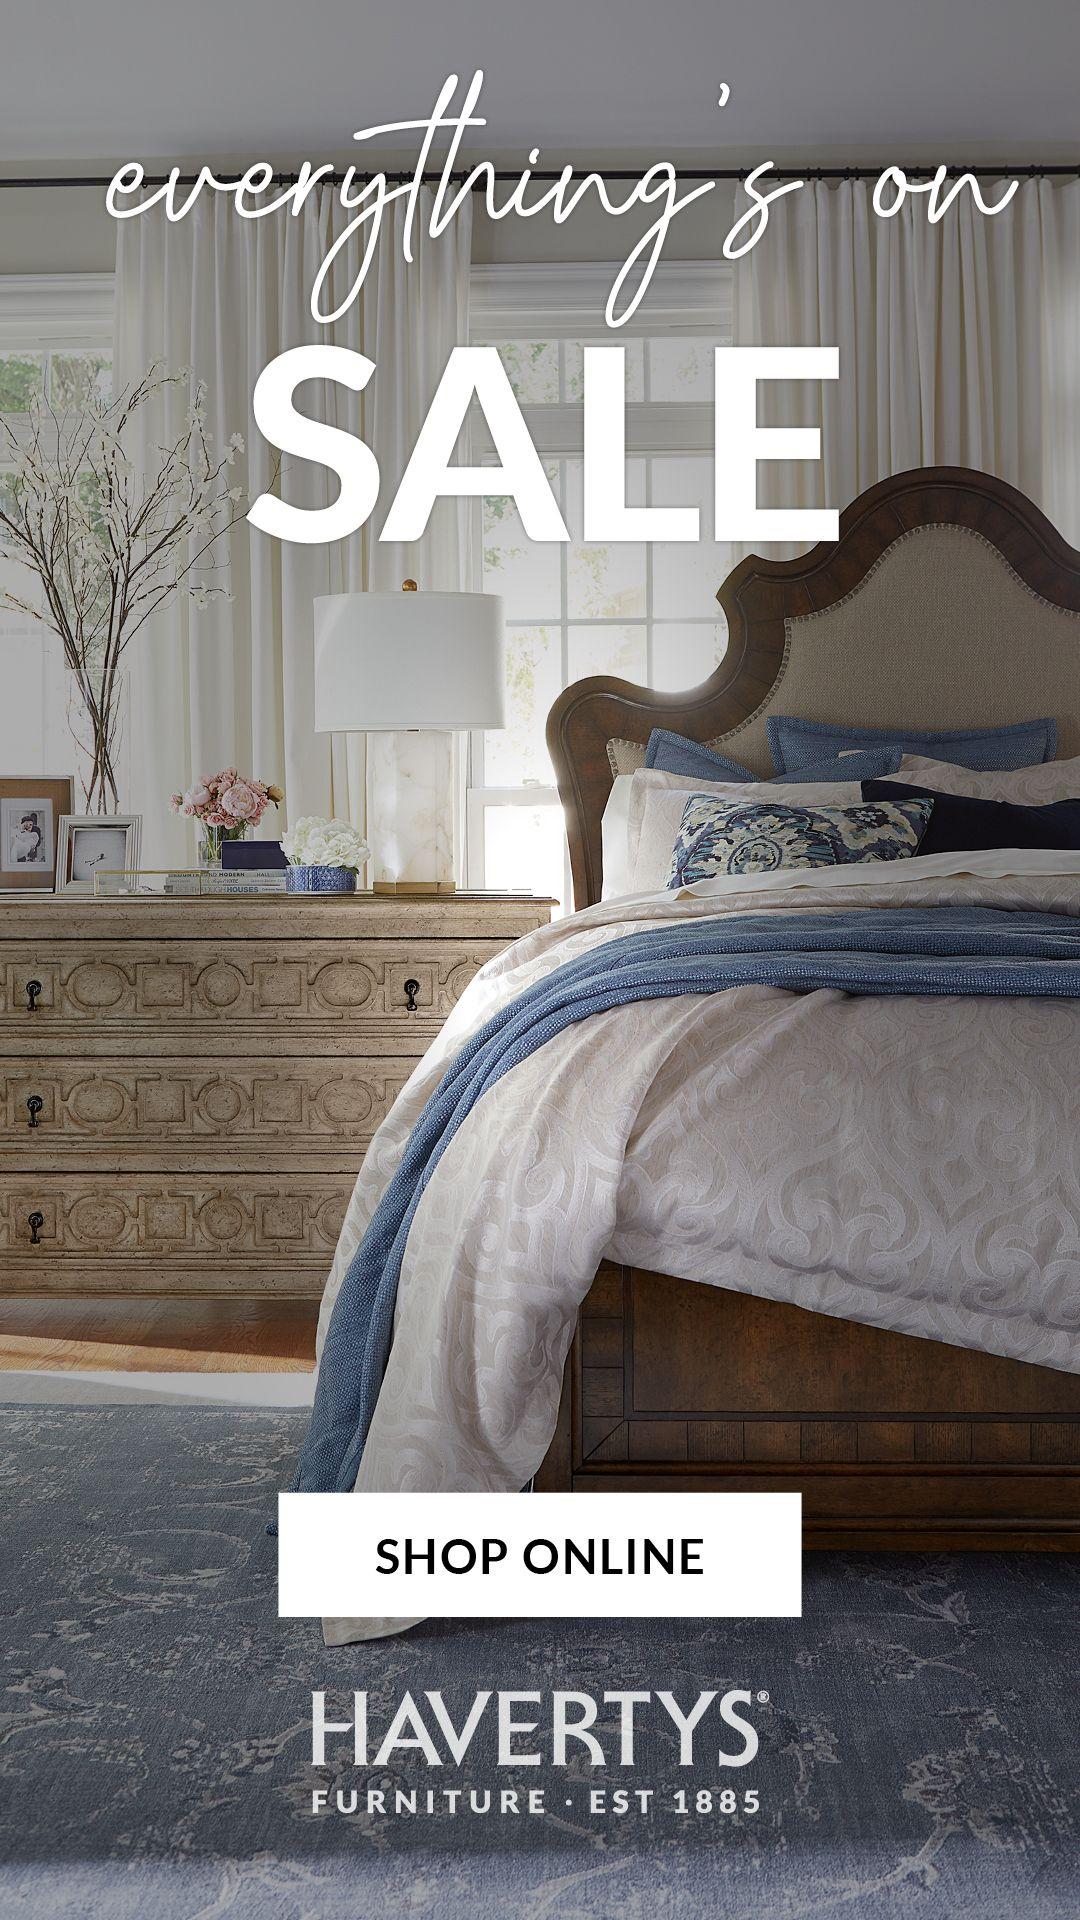 Buy Online Pick Up In Store In 2020 Vintage Industrial Decor Bedroom Pretty Bedroom Industrial Decor Bedroom